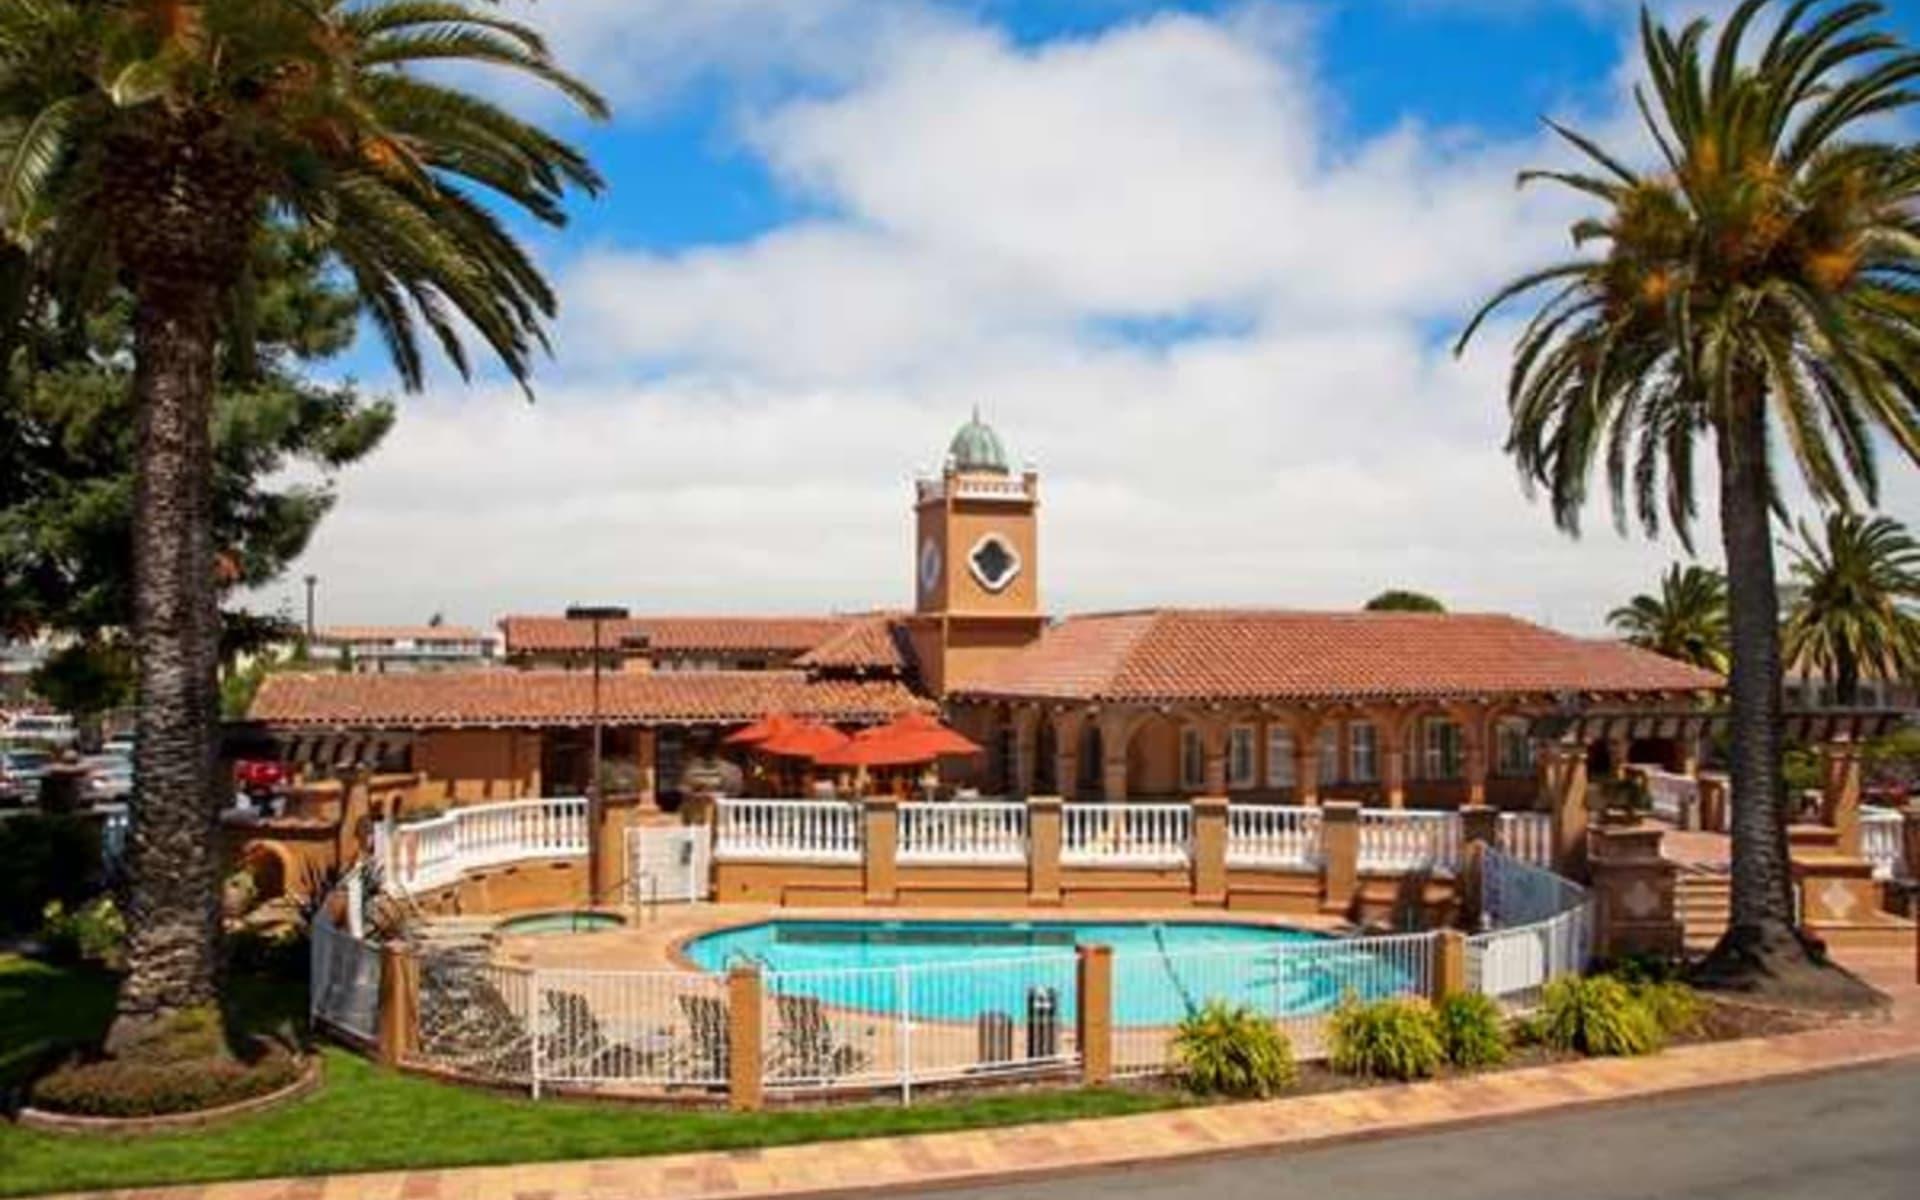 El Rancho Inn, BW Signature Collection in Millbrae (San Francisco): Exterior_El Rancho Inn_Aussenansicht_ATI